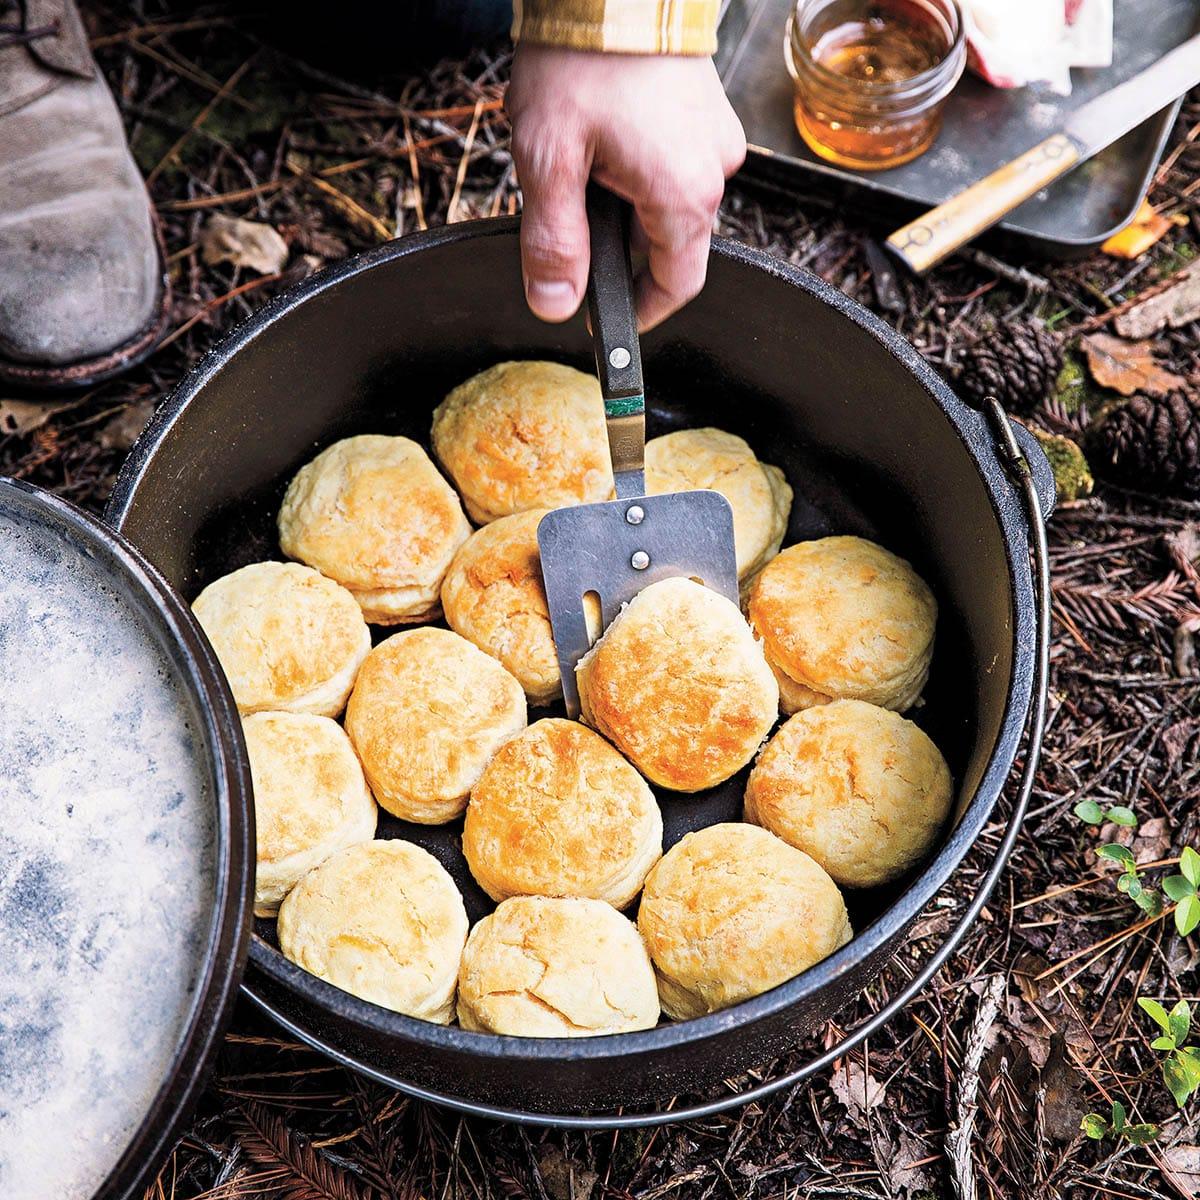 Biscuits in a Dutch oven